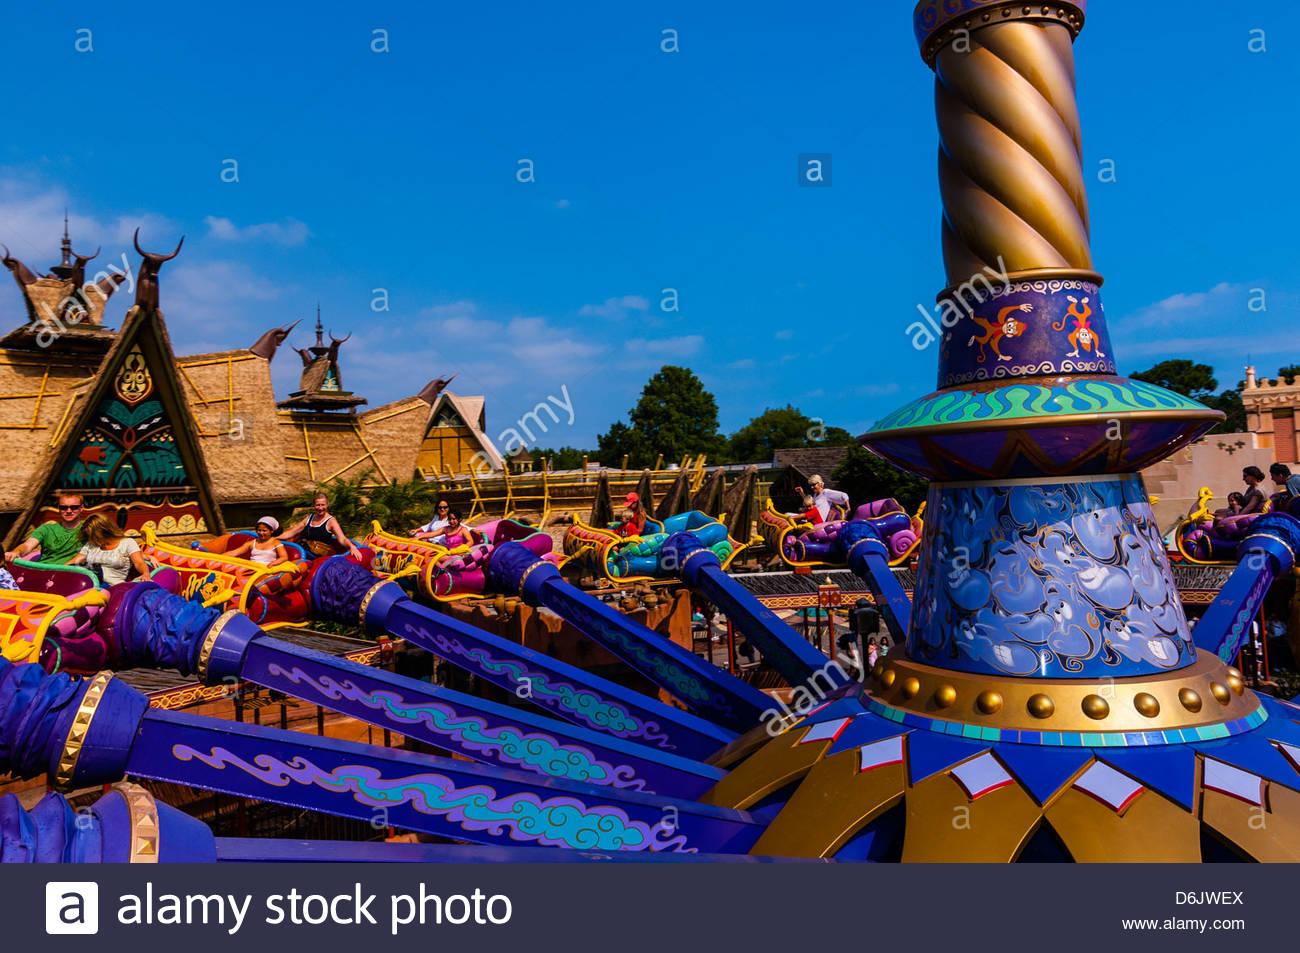 Walt Disney World The Magic Carpets Of Aladdin Carpet